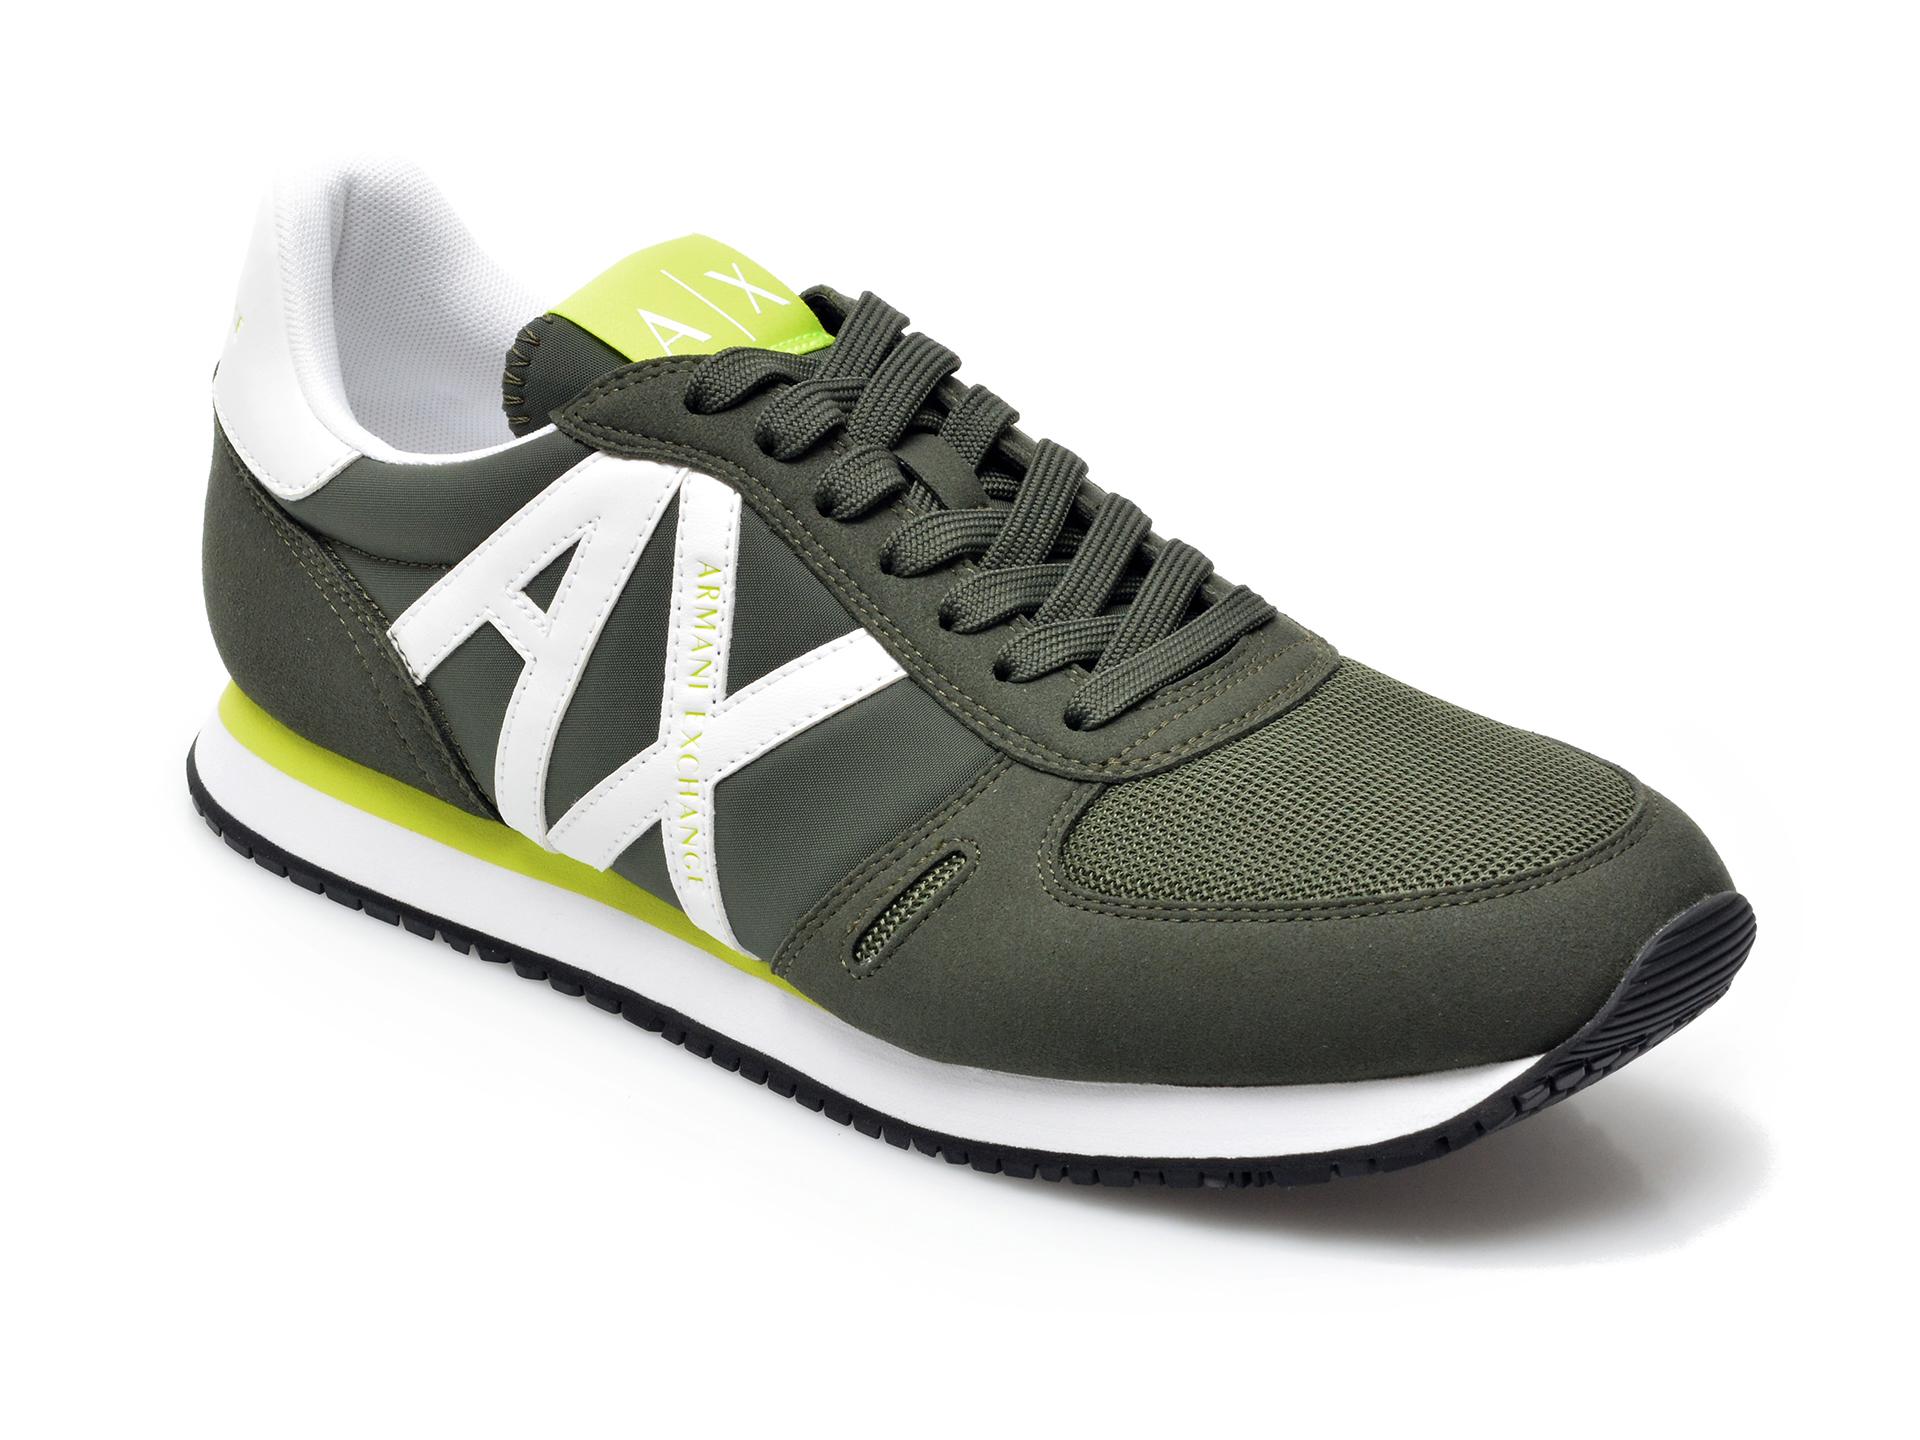 Pantofi Sport Armani Exchange Kaki, Xux017, Din Material Textil Si Piele Ecologica